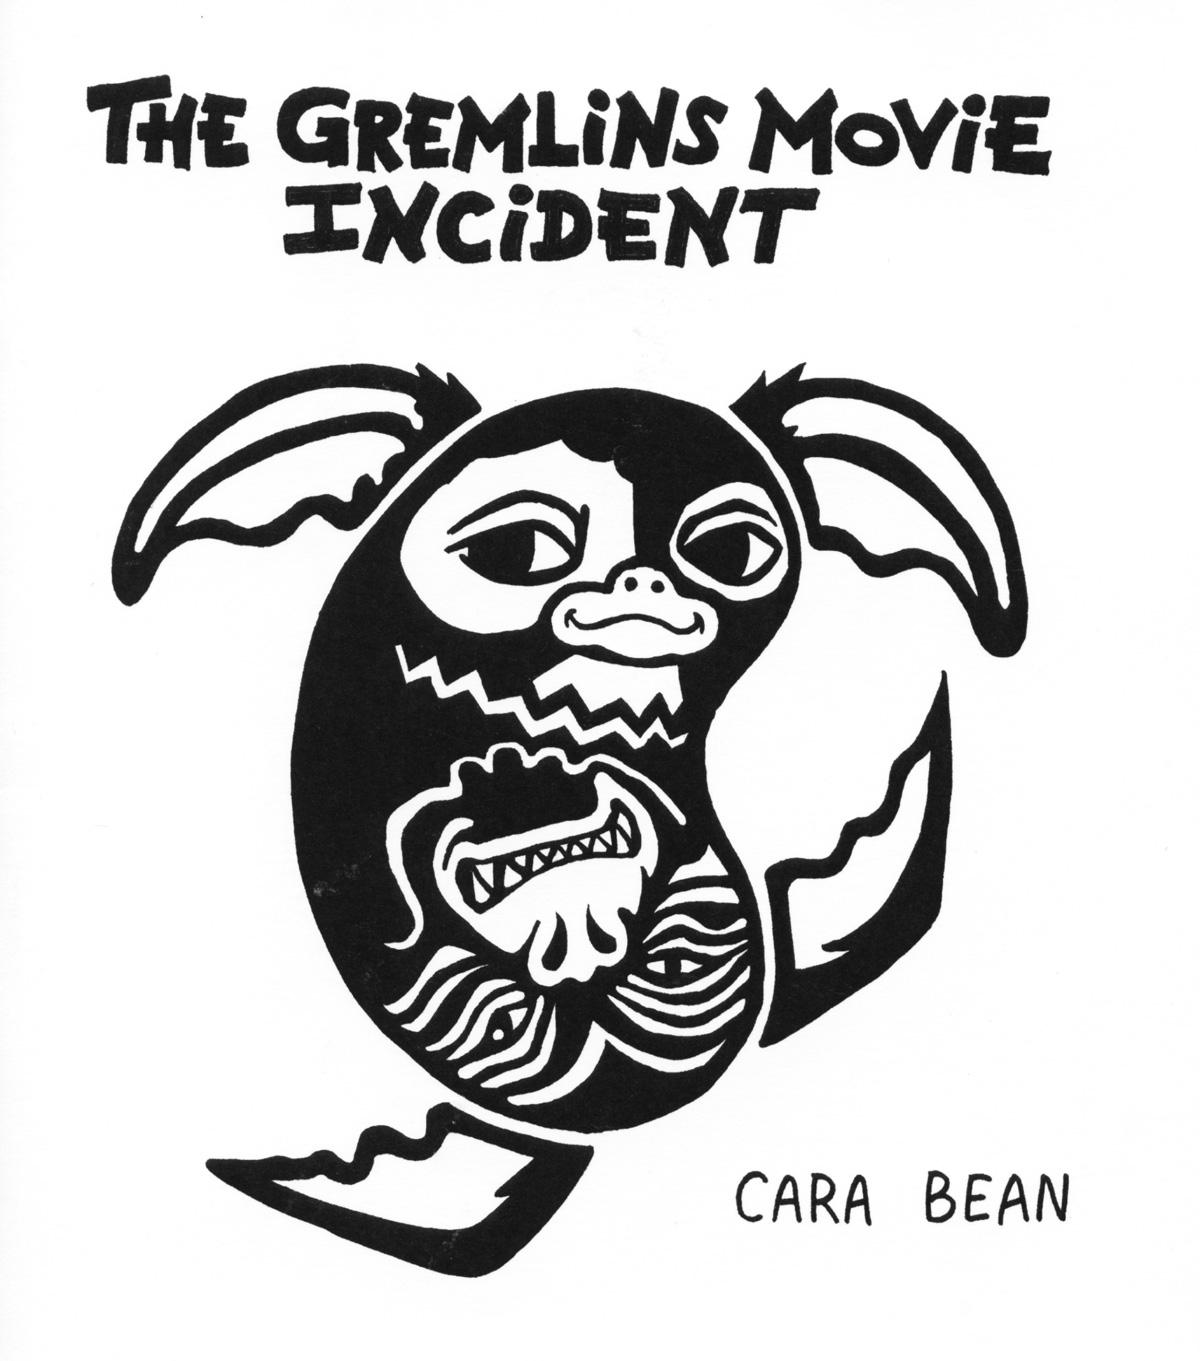 The Gremlins Movie Incident